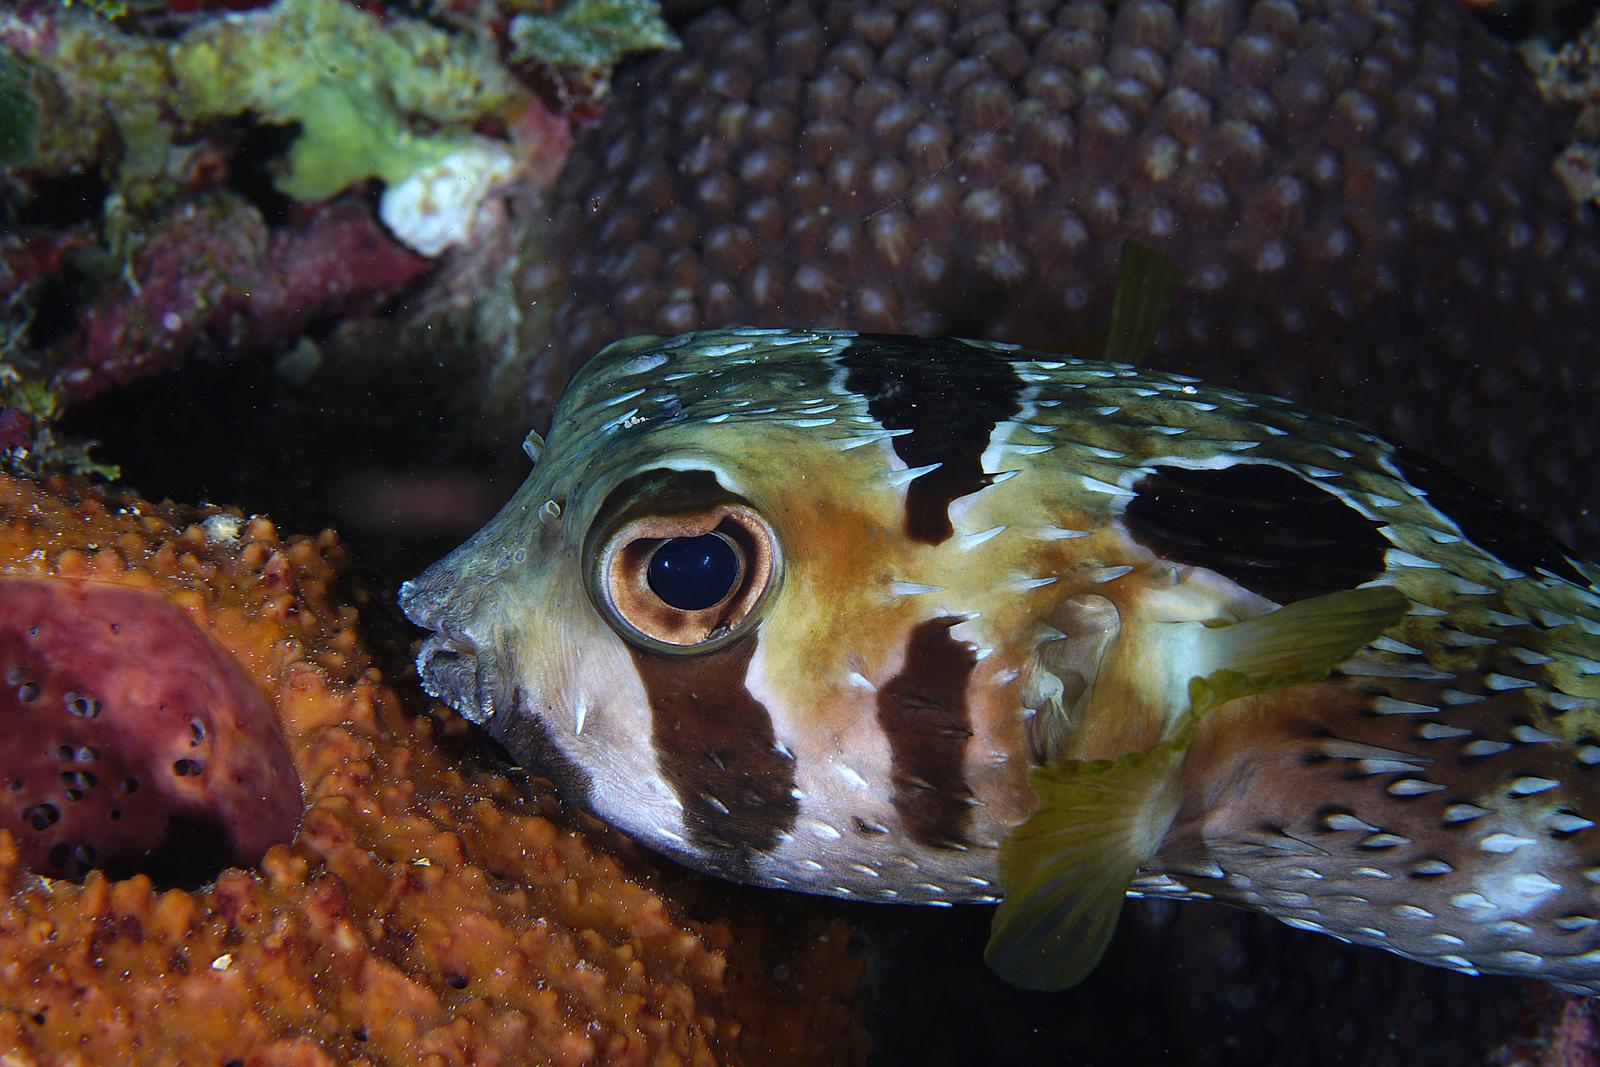 BlackBlotched Porcupine fish